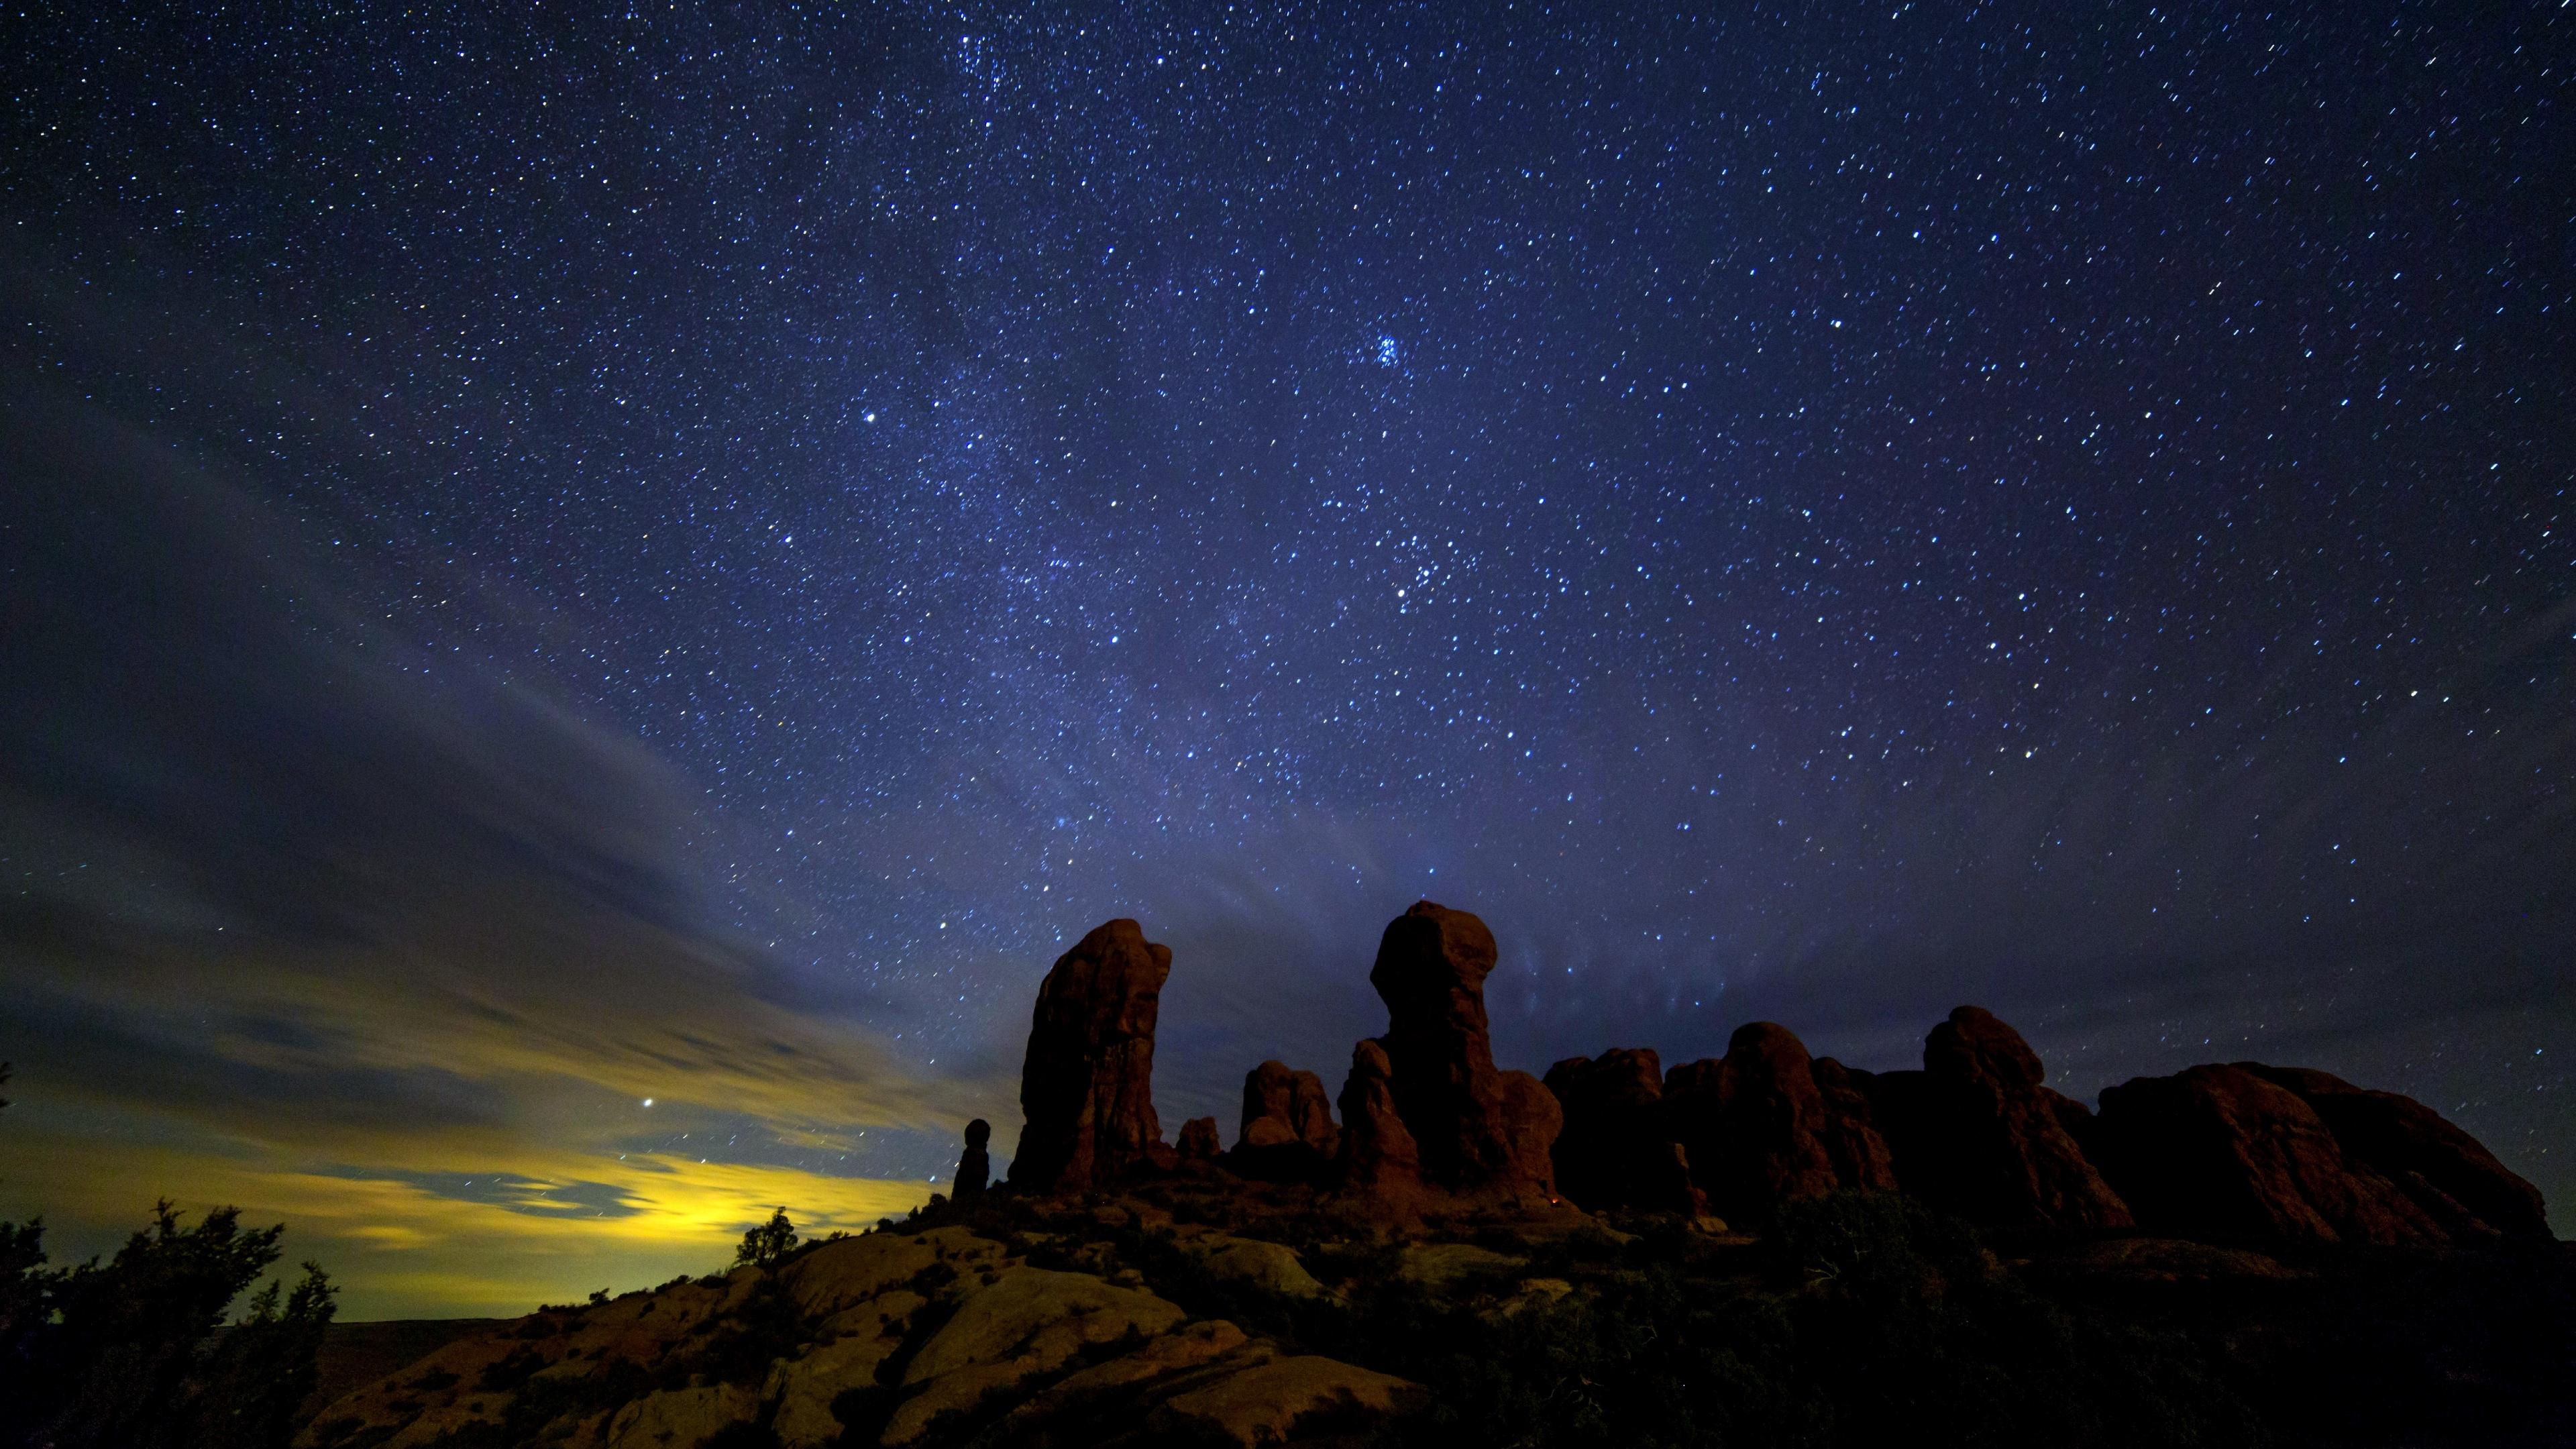 starry sky stars rocks night 4k 1541114509 - starry sky, stars, rocks, night 4k - Stars, starry sky, Rocks